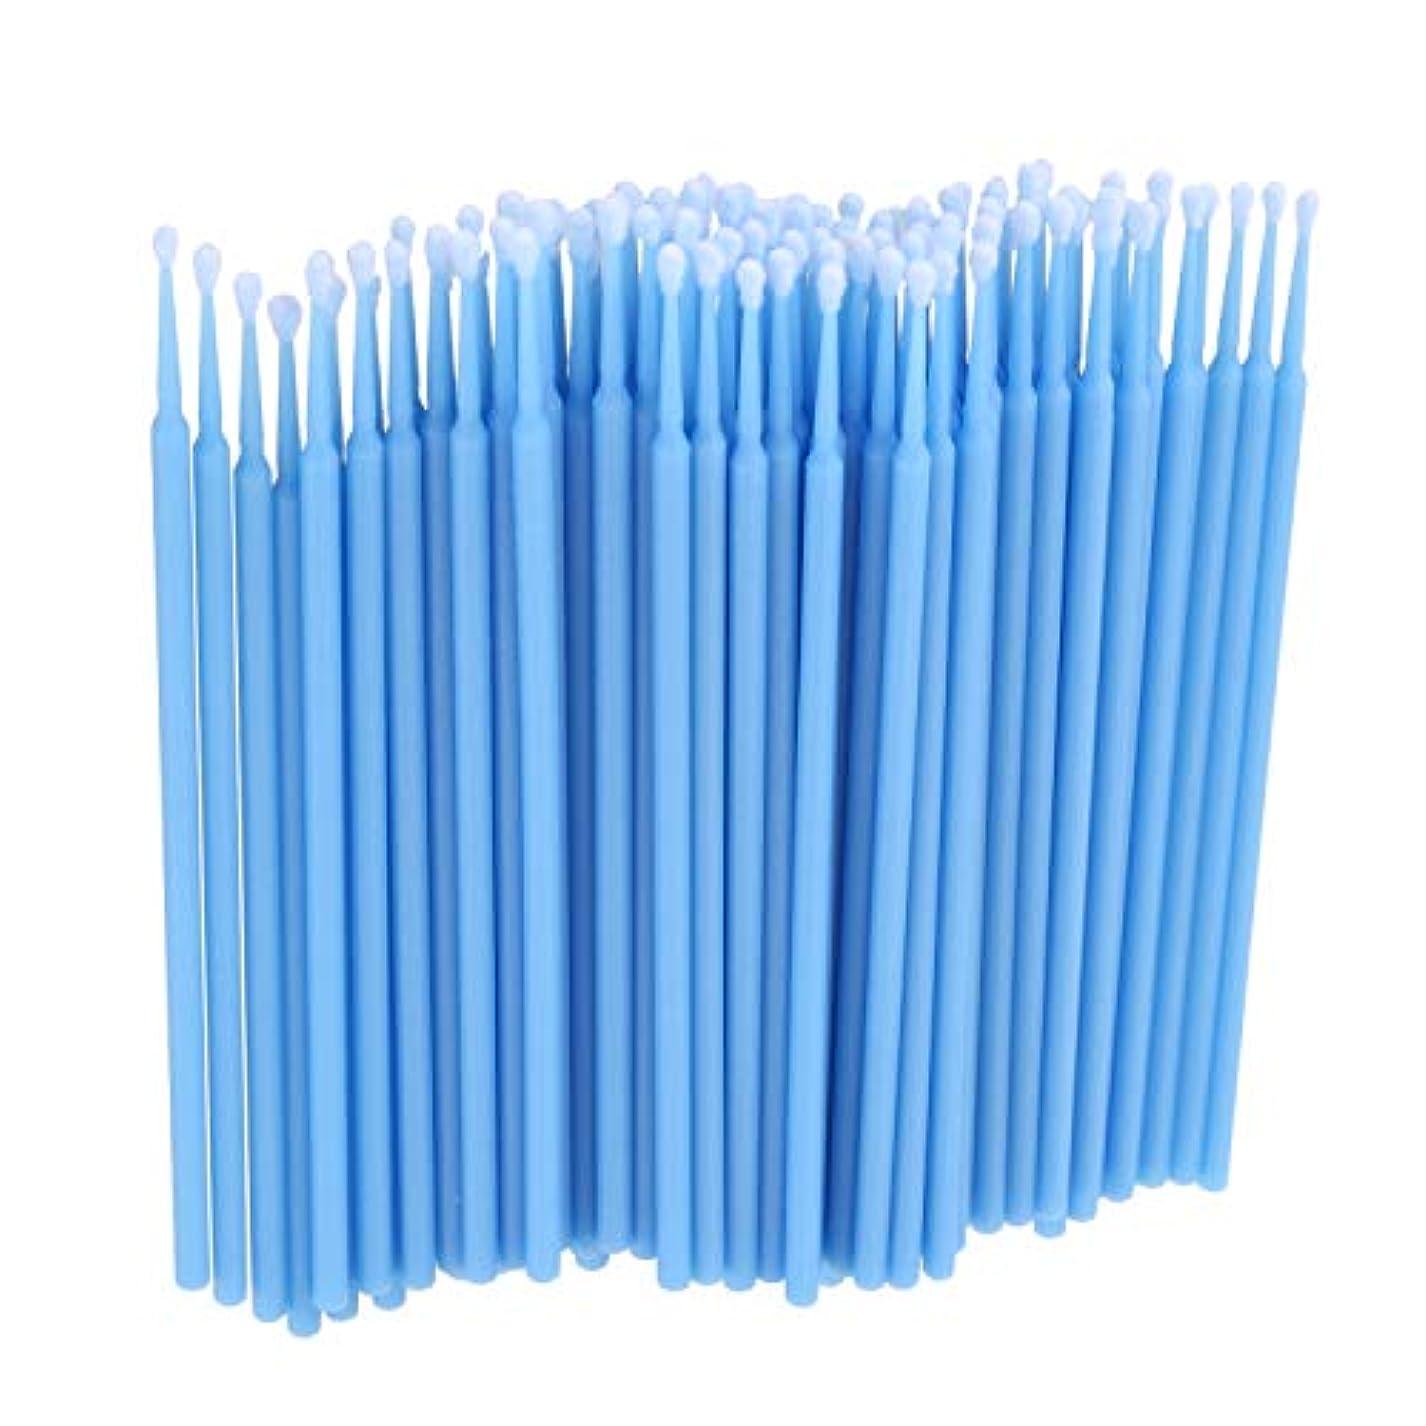 TOOGOO 100個 歯科用マイクロブラシ 使い捨て材料 歯用アプリケーター ミディアムファイン(ライトブルー)